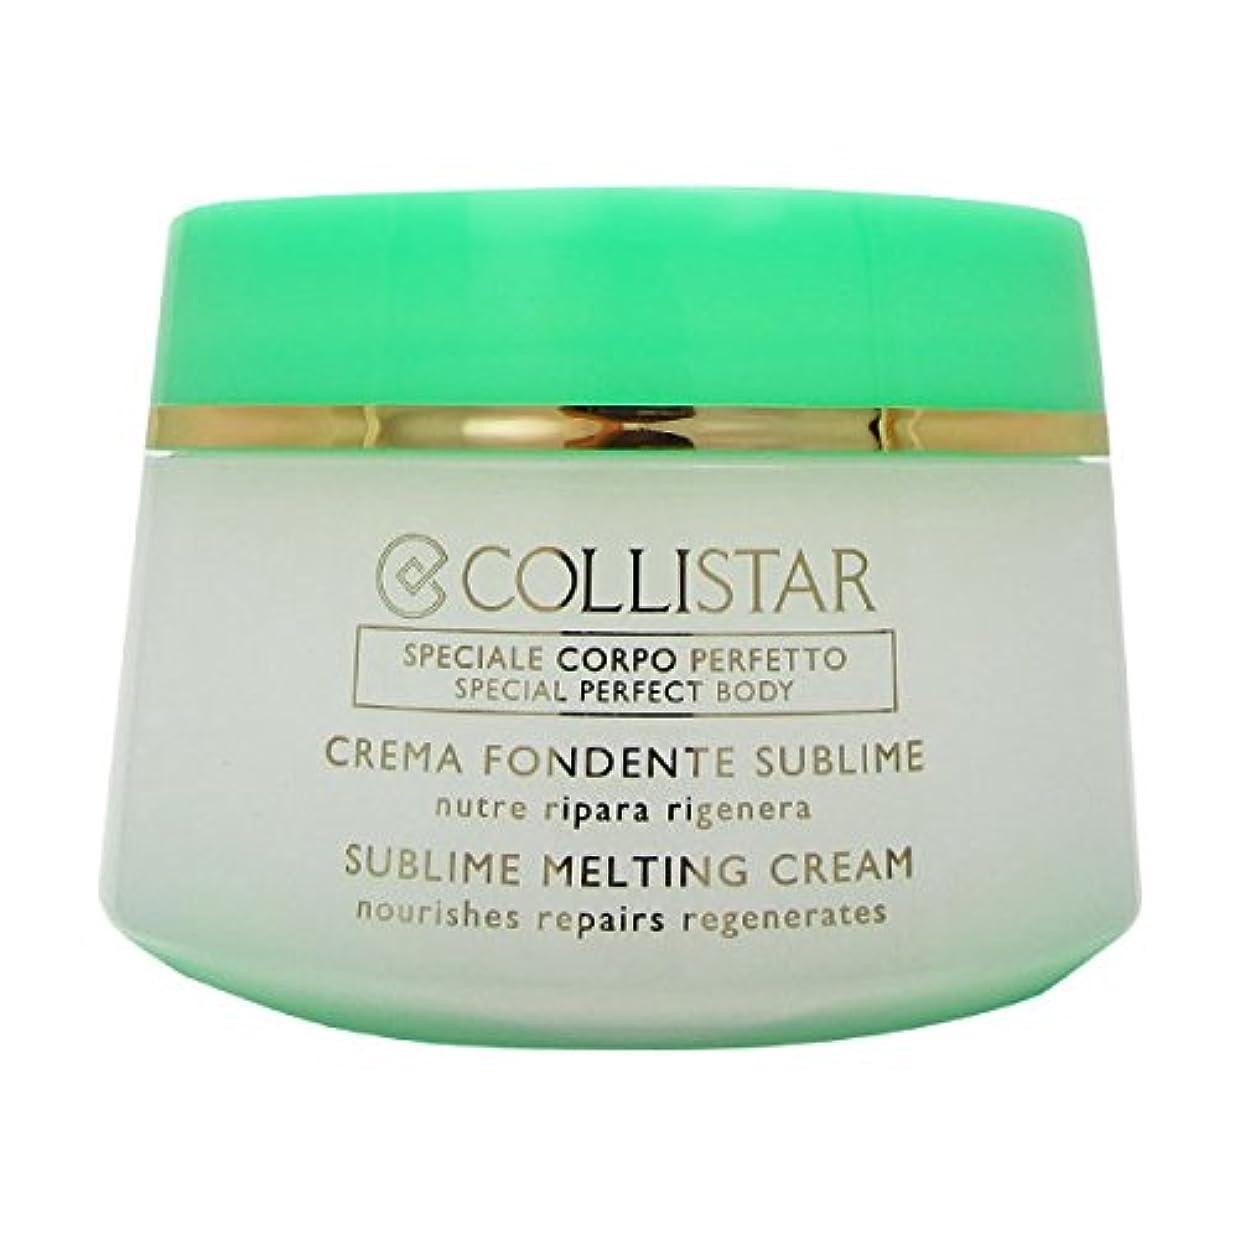 Collistar Sublime Melting Cream 400ml [並行輸入品]